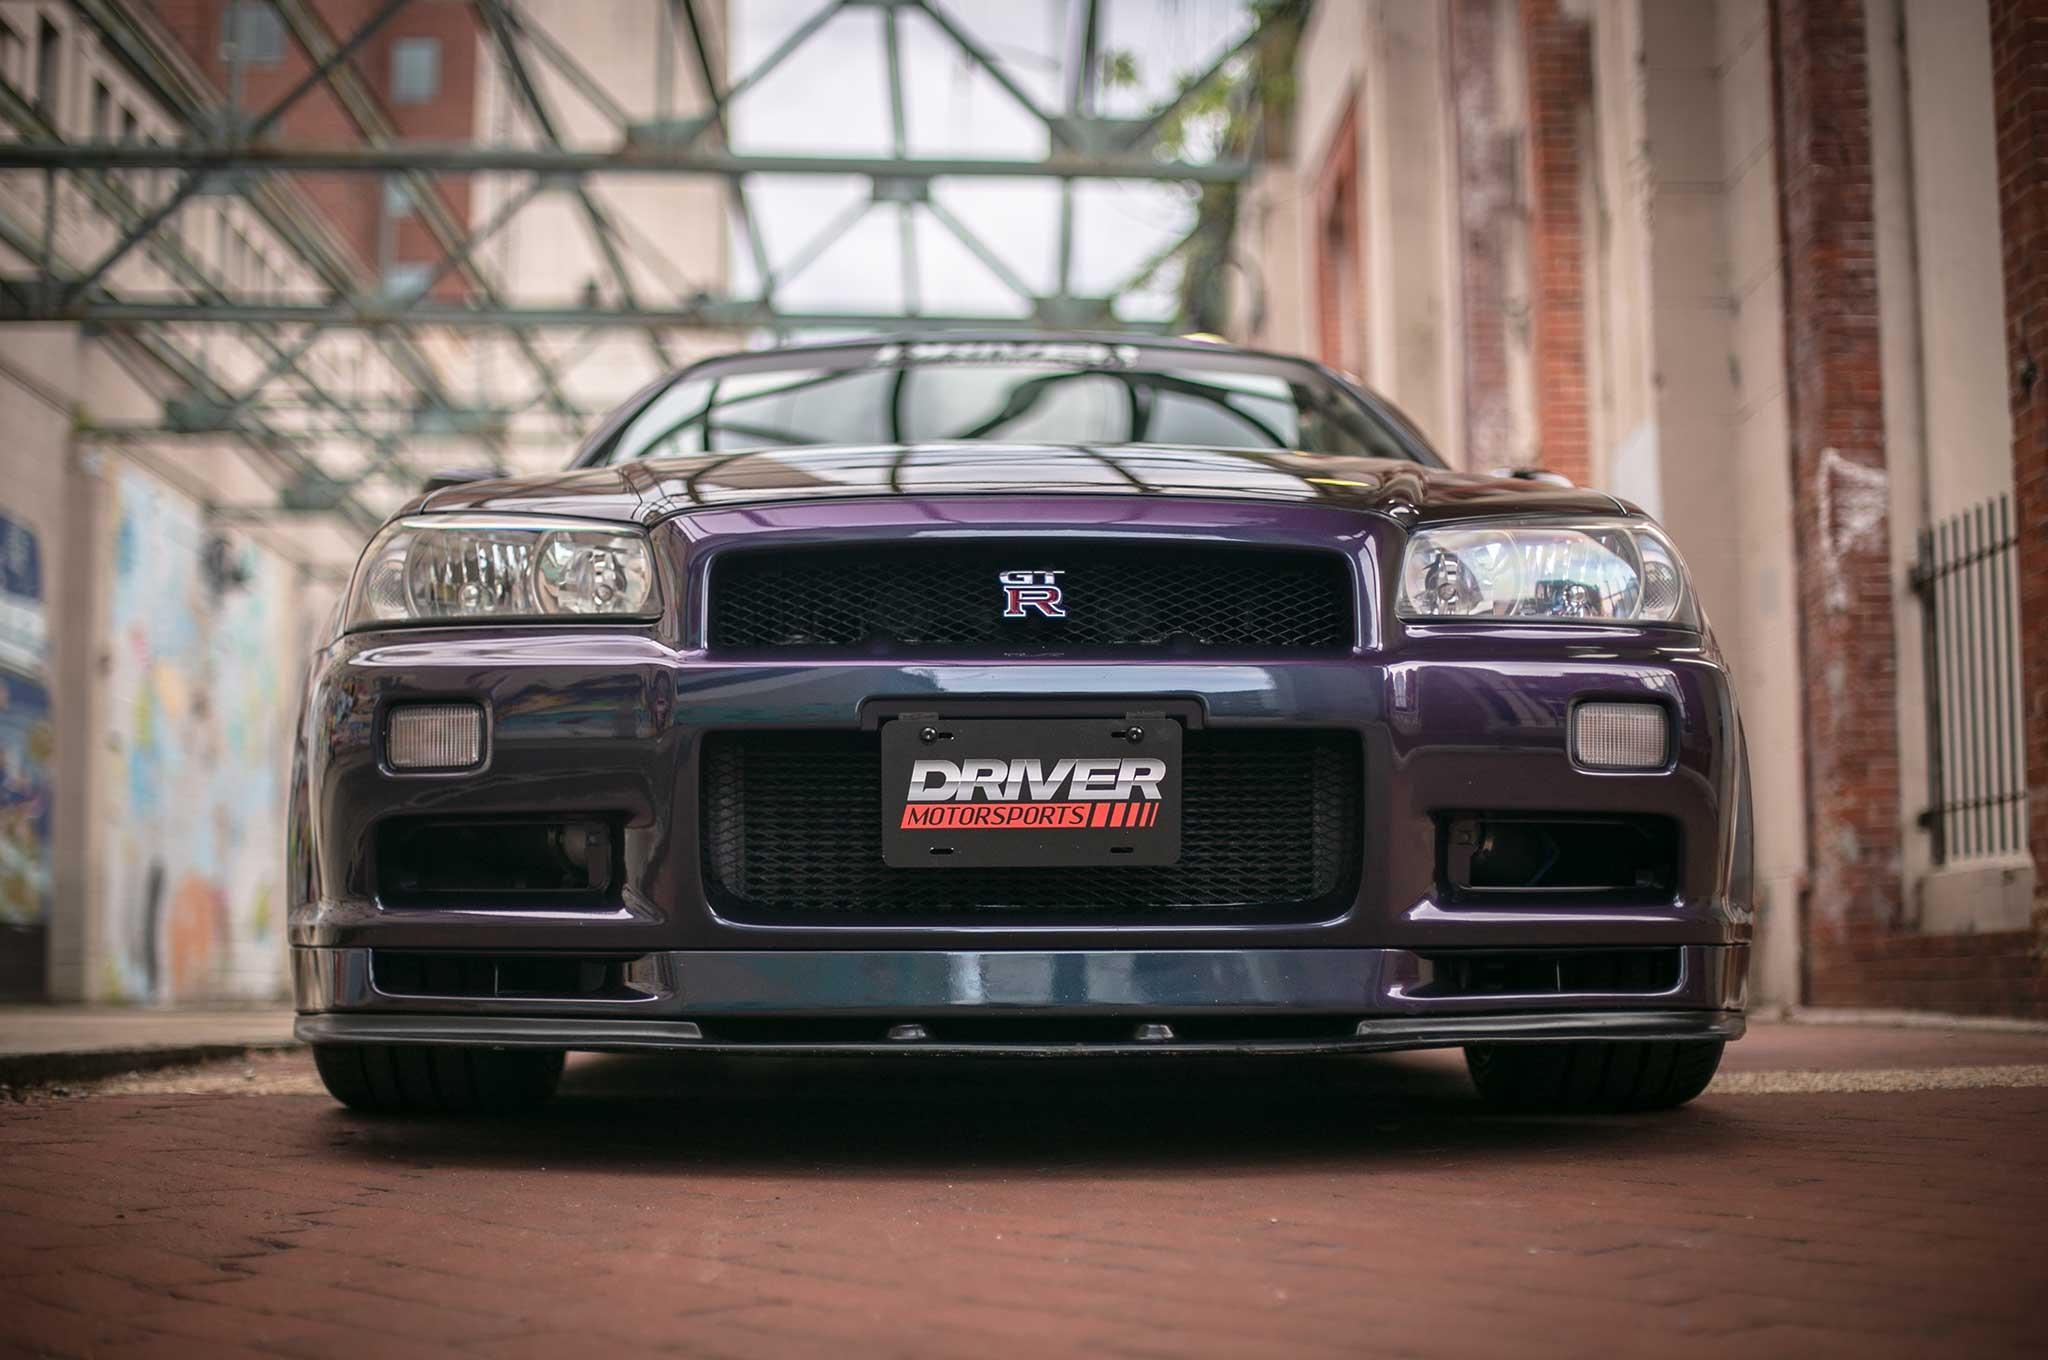 U S Legal Nissan R34 Skyline Gt R V Spec Limited Edition Midnight Purple On Volk Racing Te37s